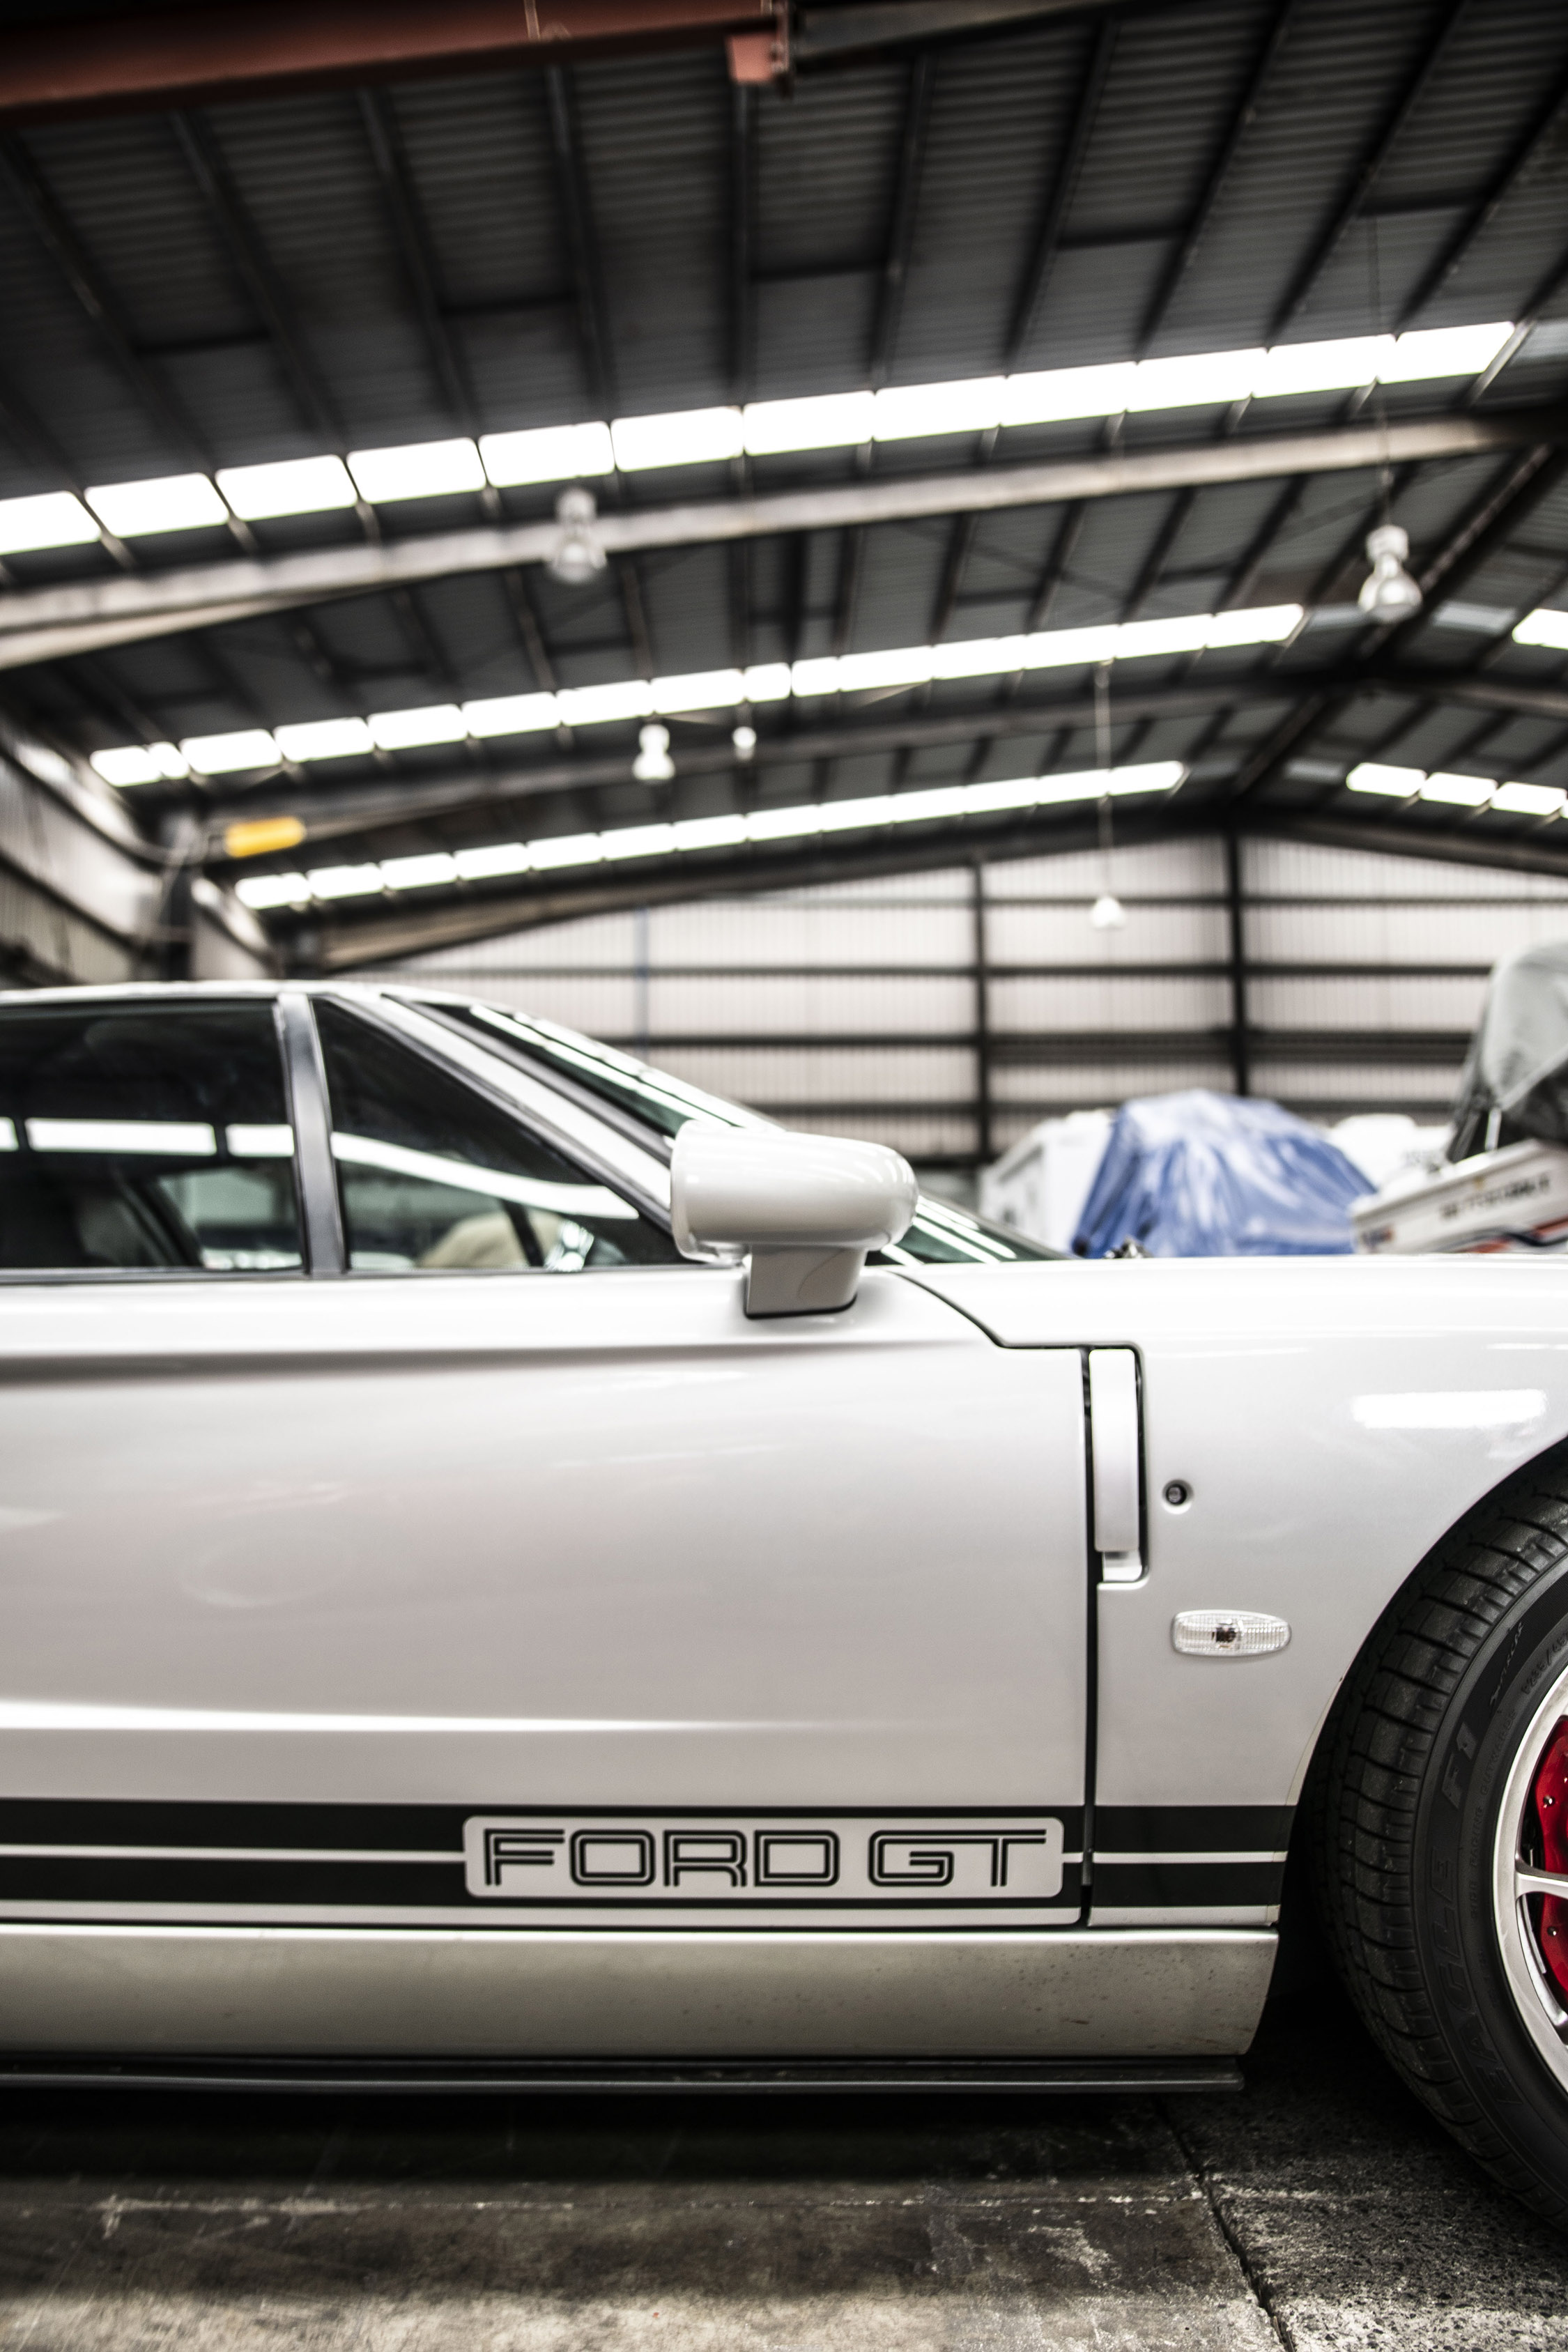 leon fitzpatrick porsche gt40 autohouse storage cars and coffee